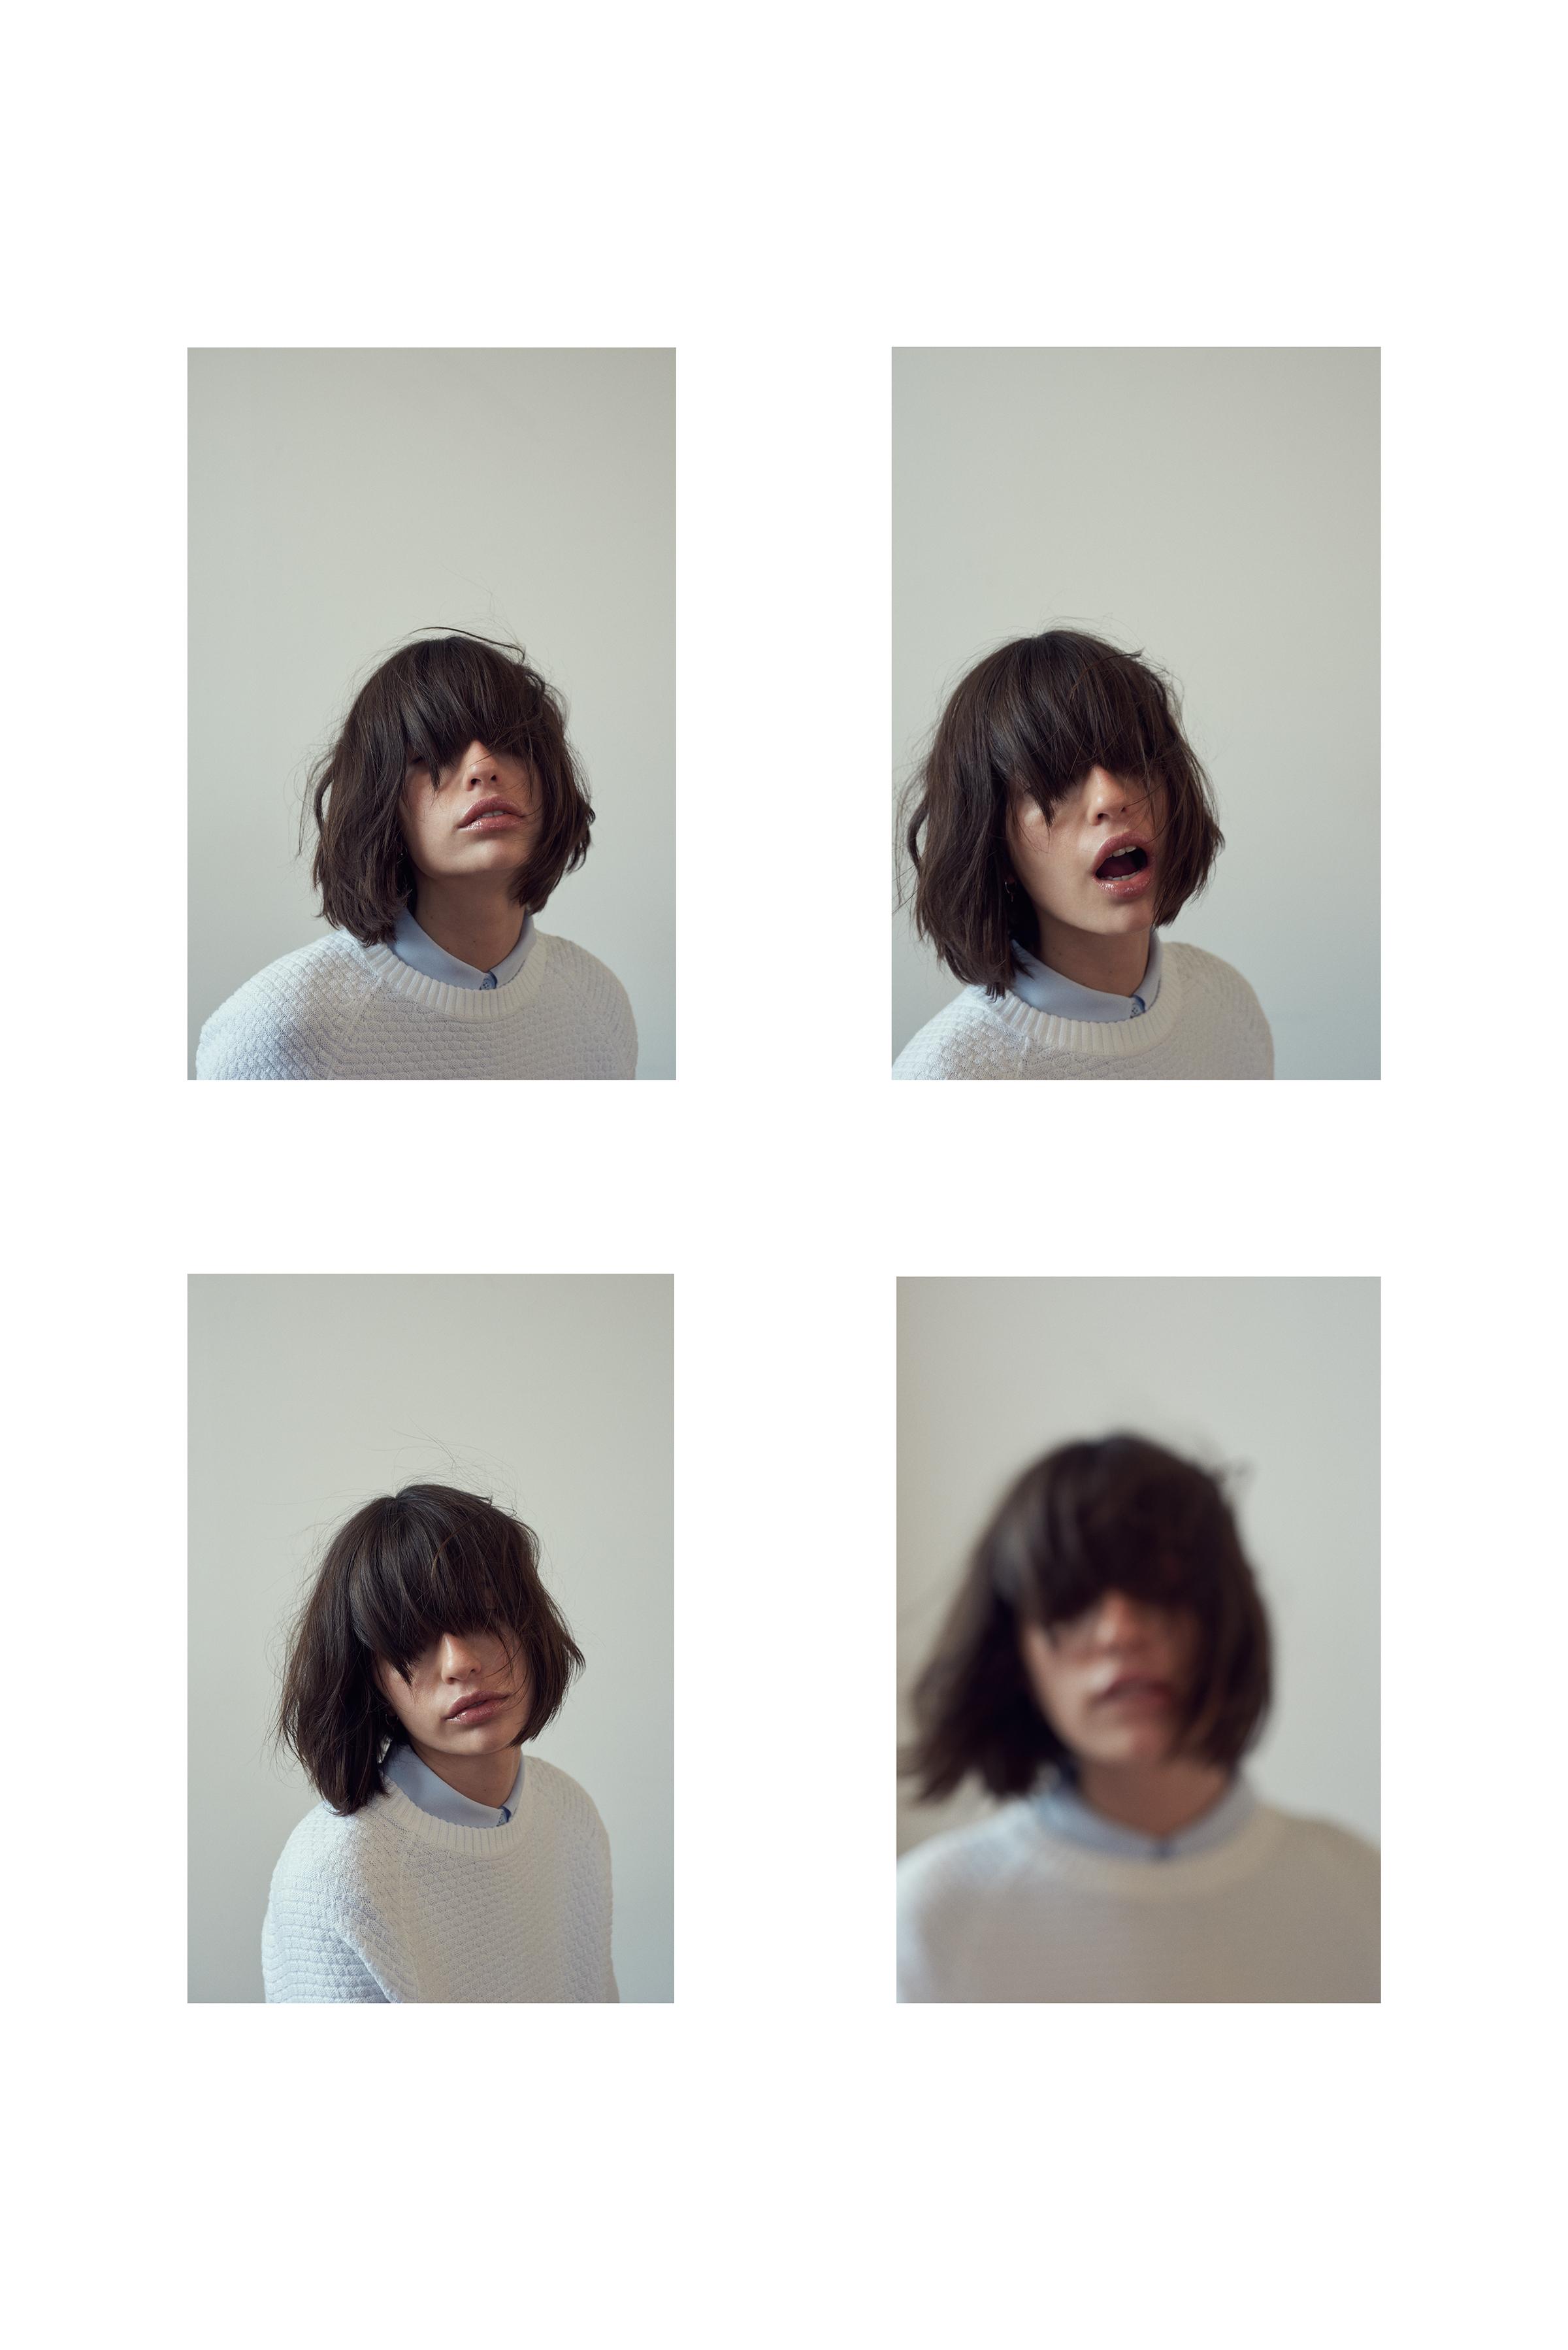 Sweater  Giu Giu   Shirt  stylists own